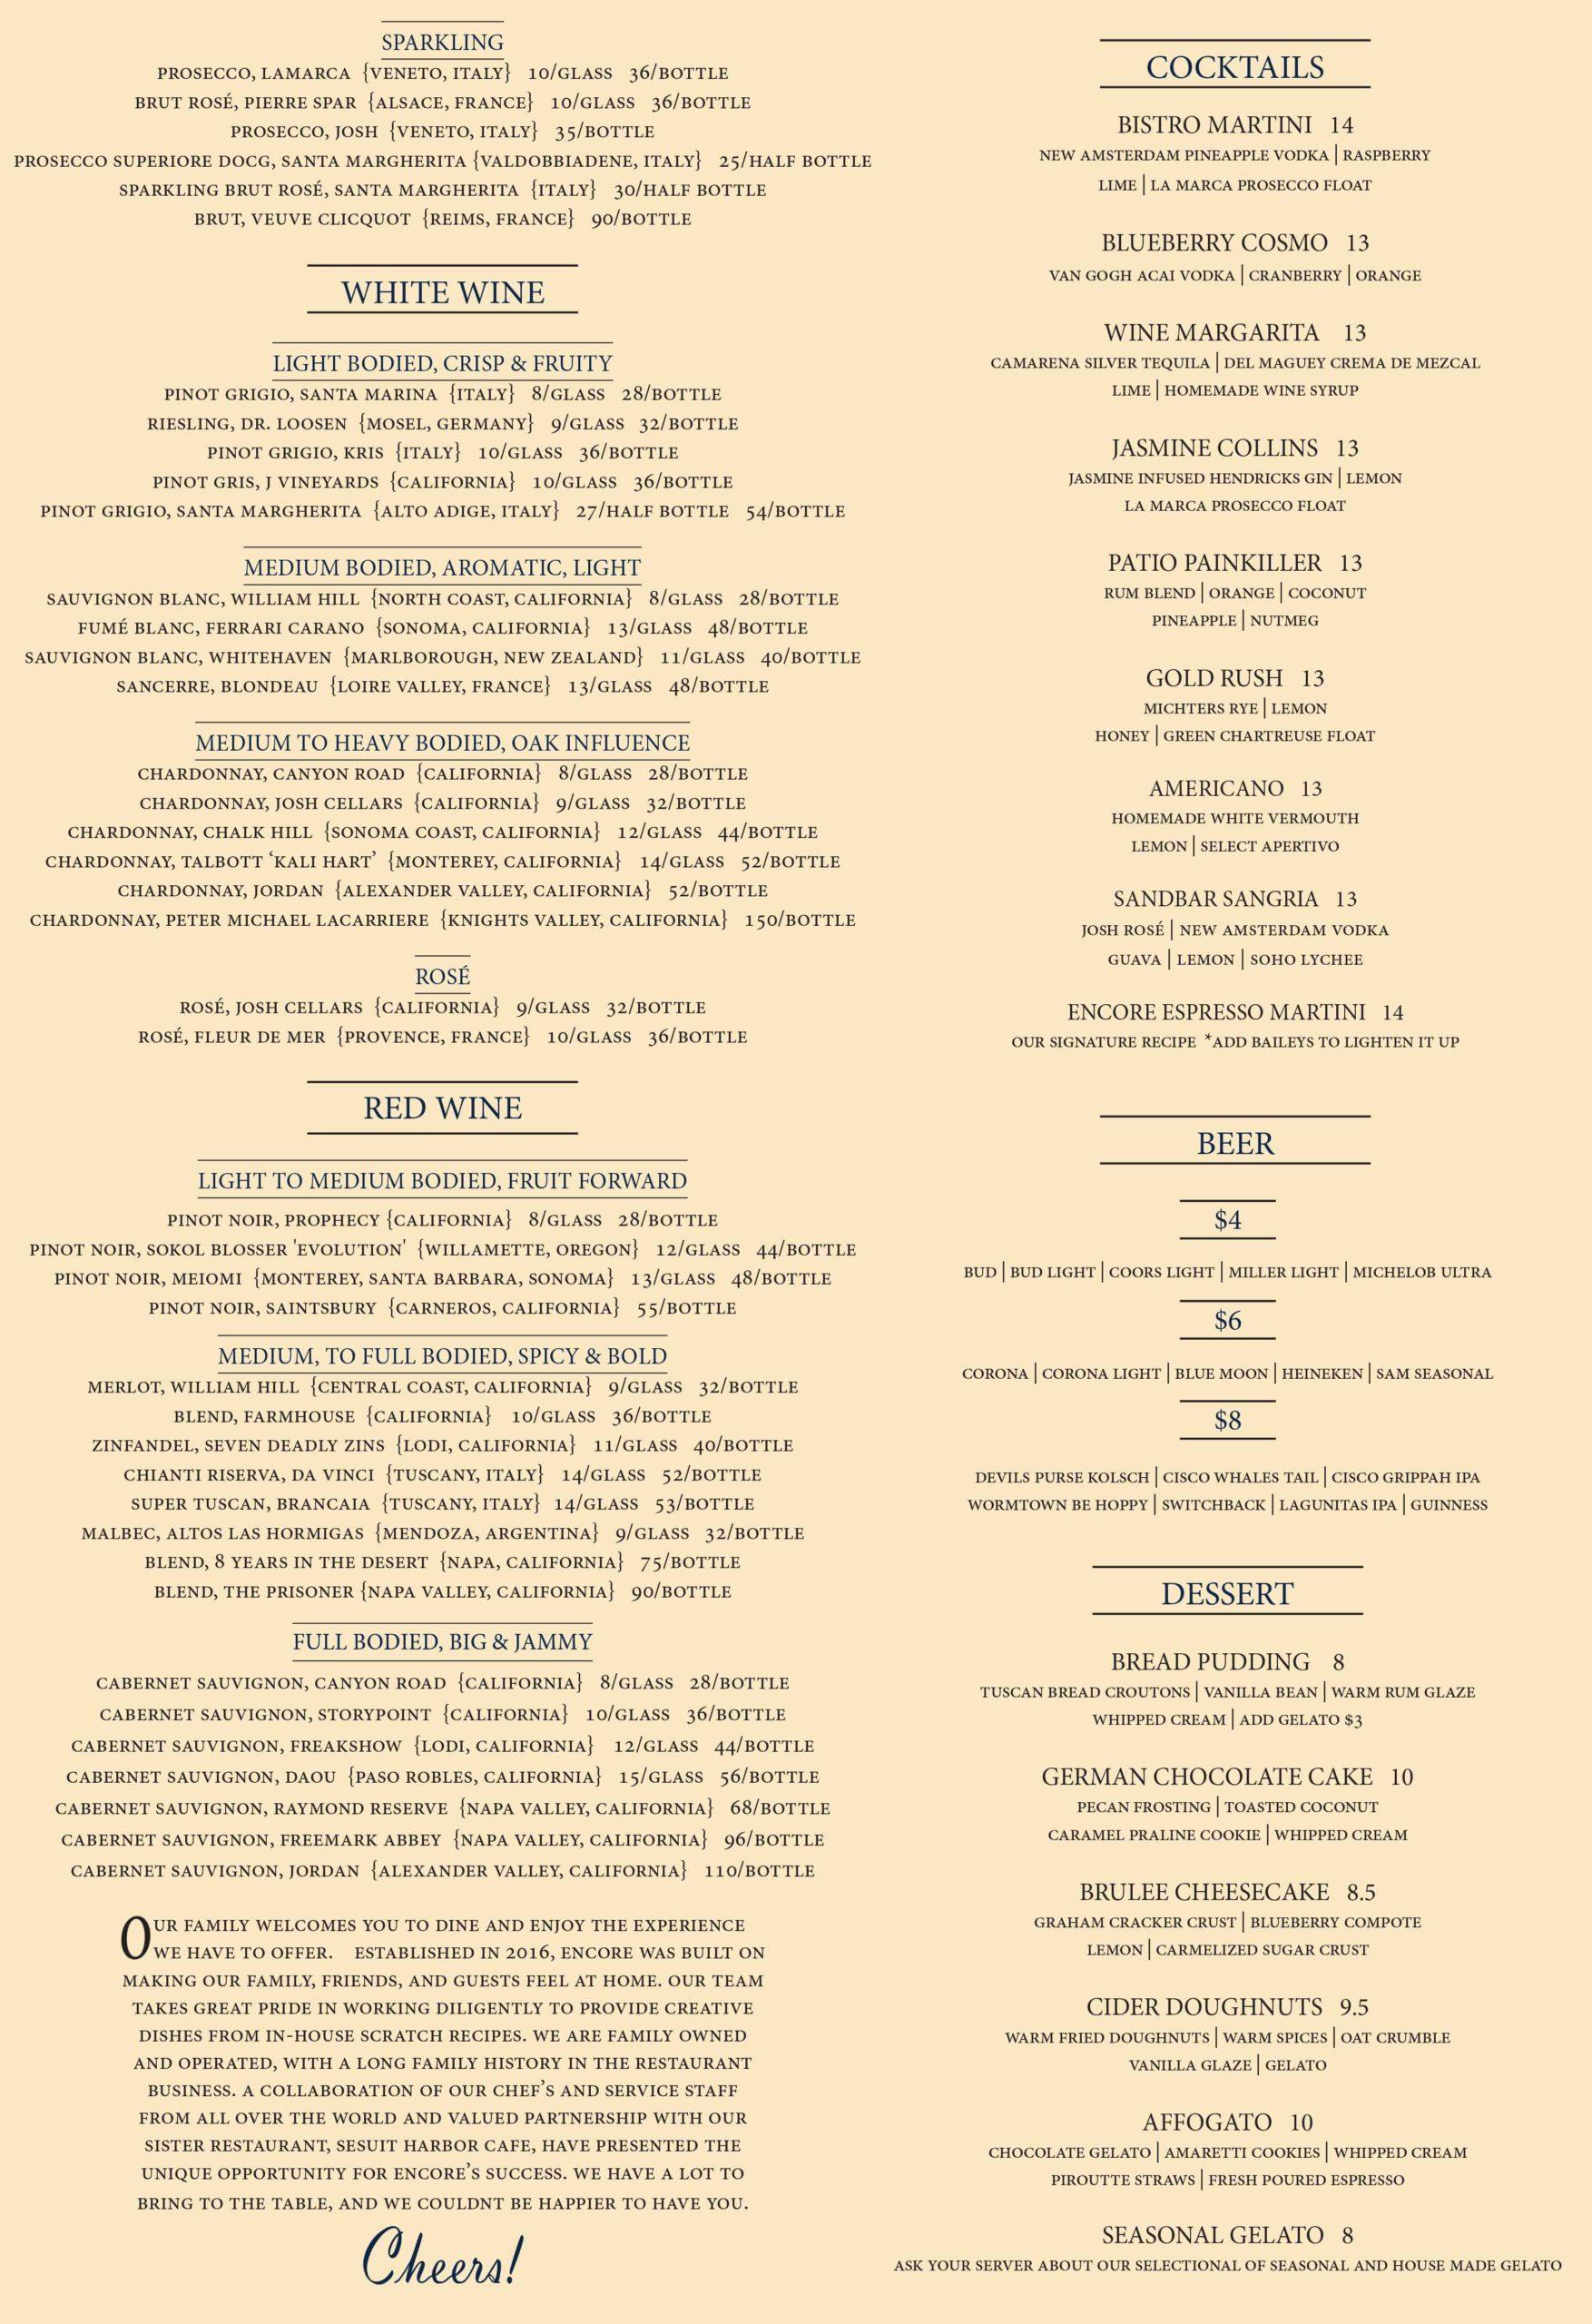 fine dining dennis cape cod mass